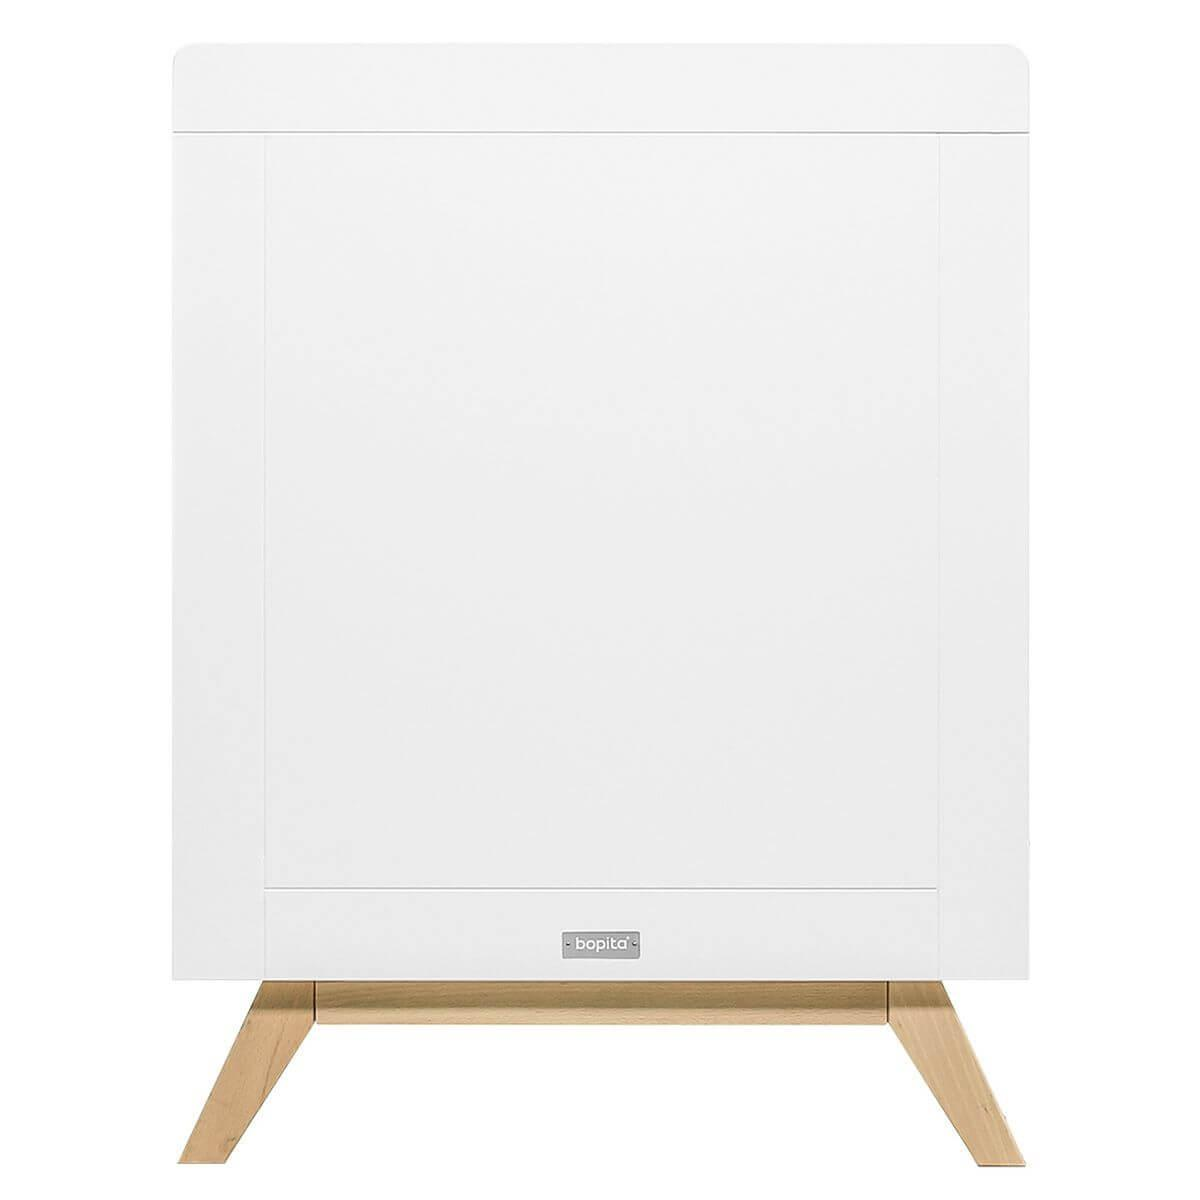 Lit 60x120cm FENNA Bopita blanc-naturel